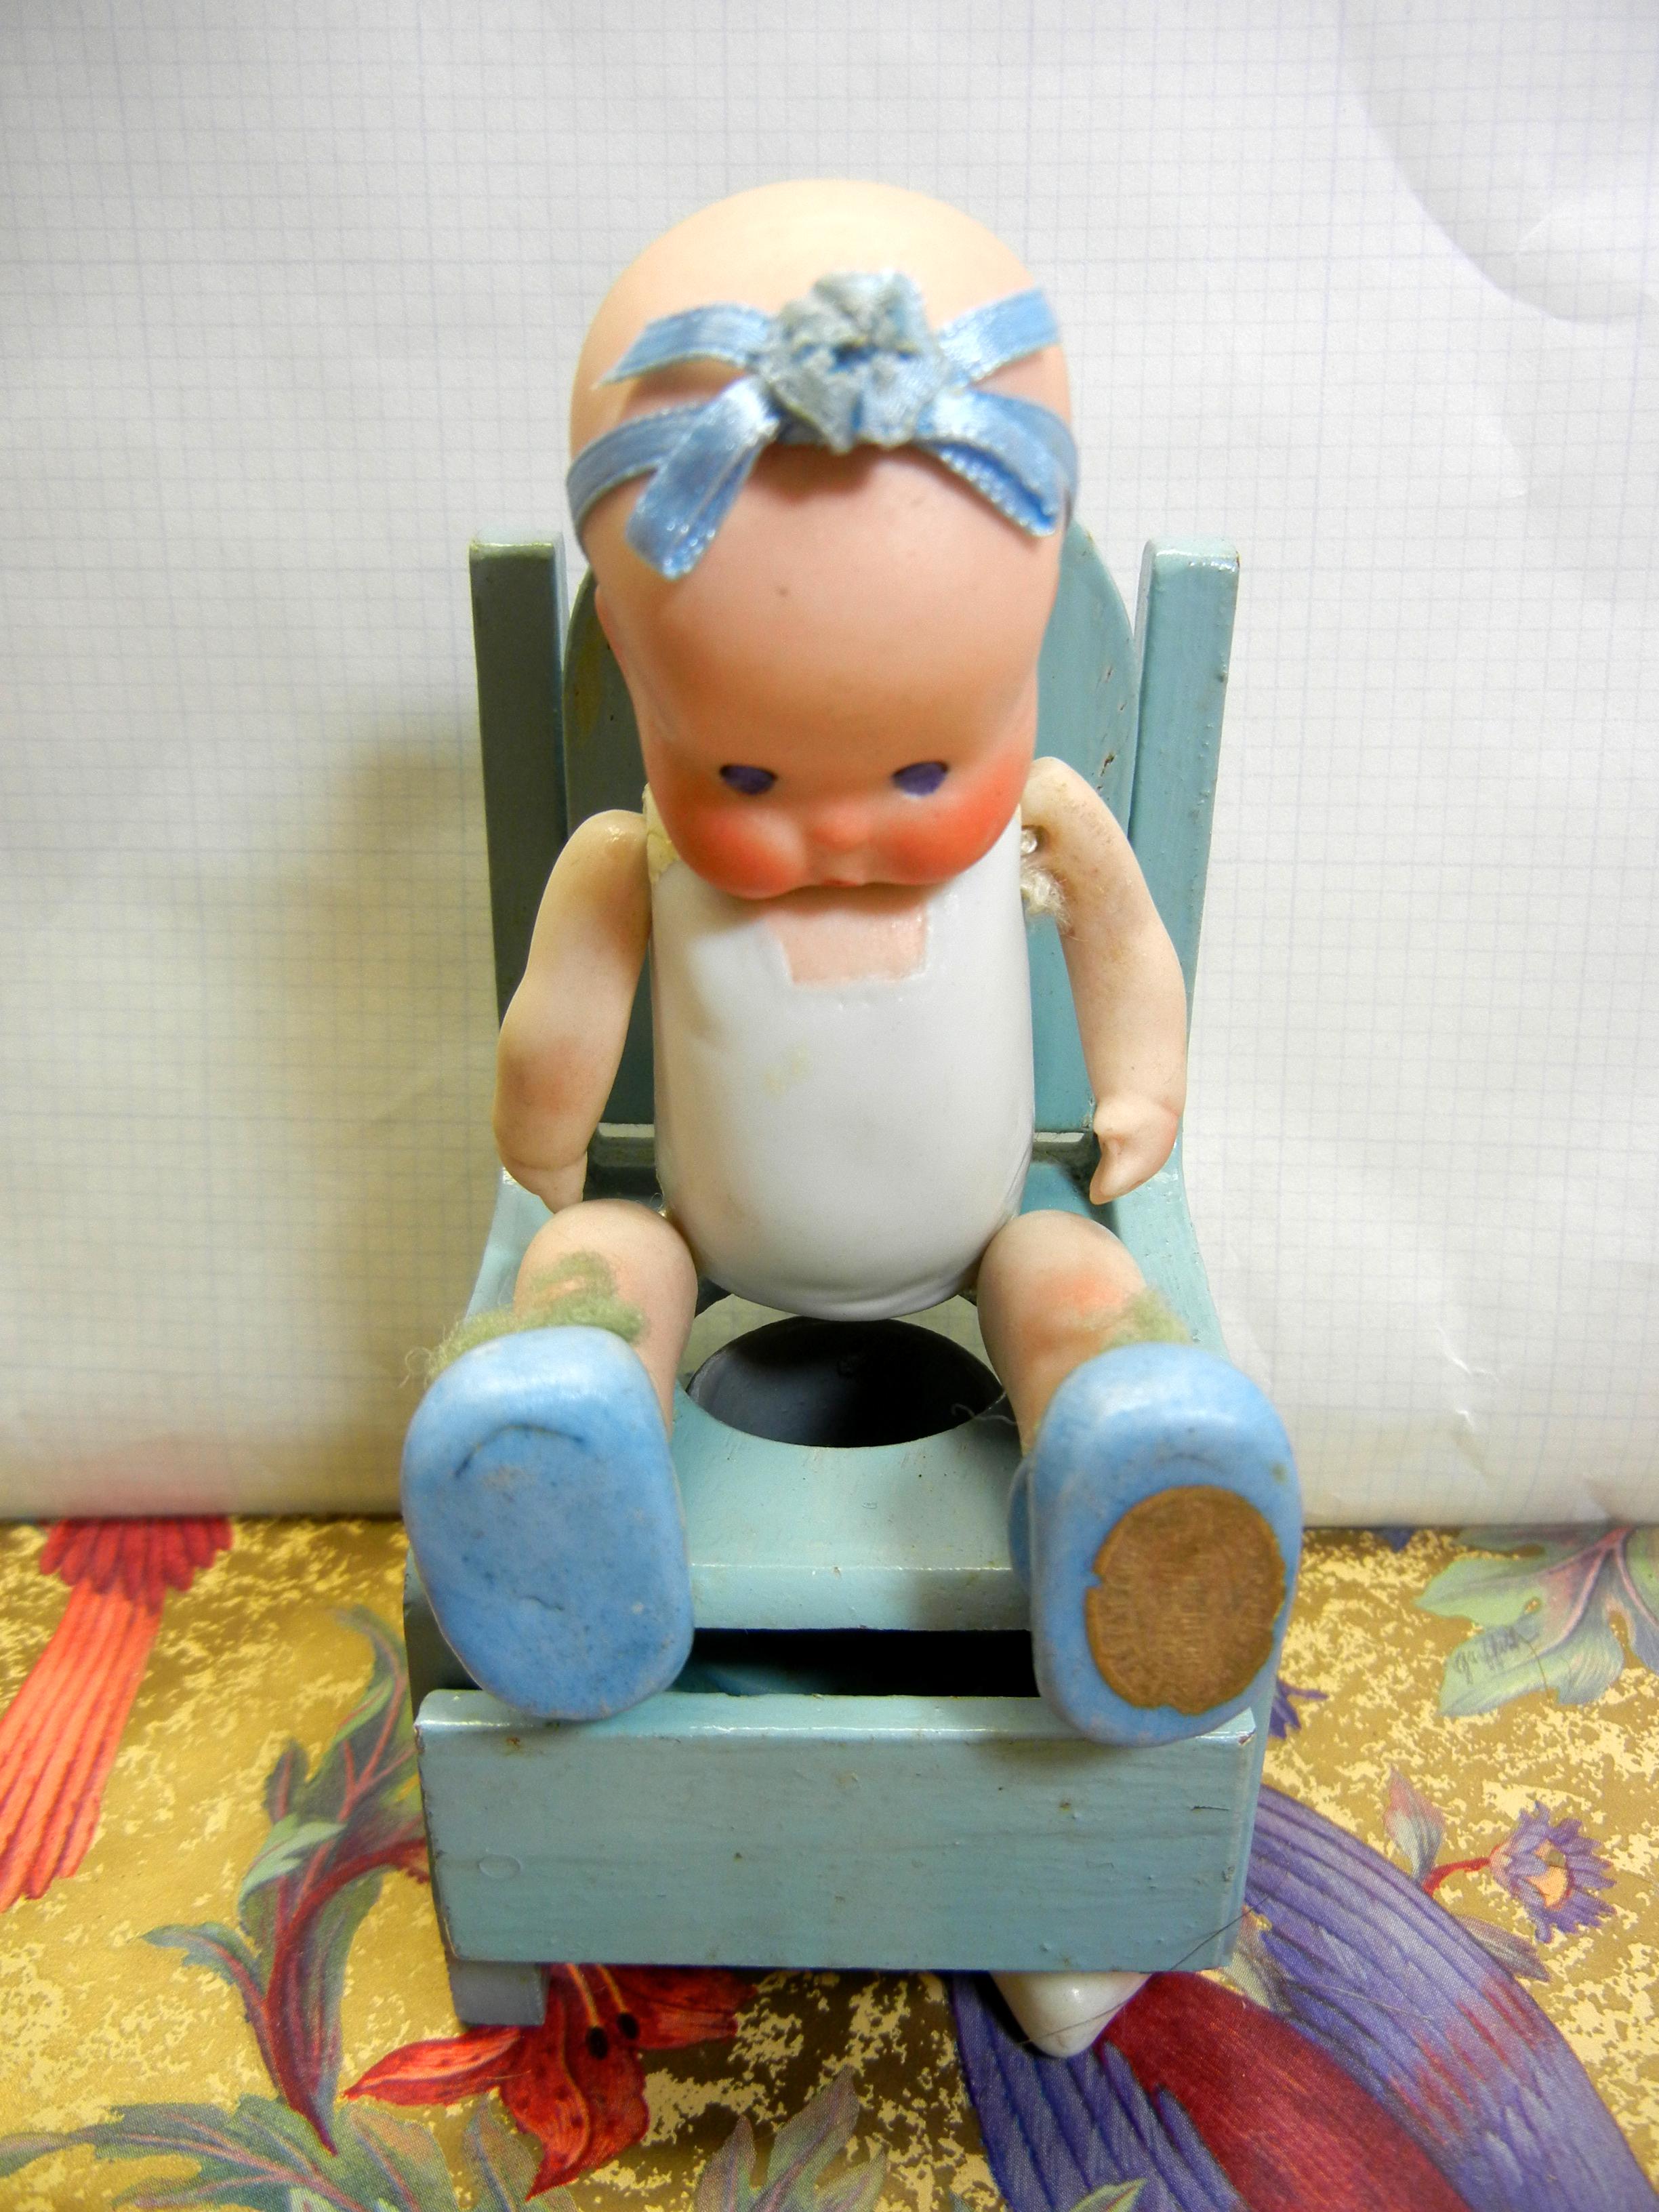 HEBee-SHEBee Doll